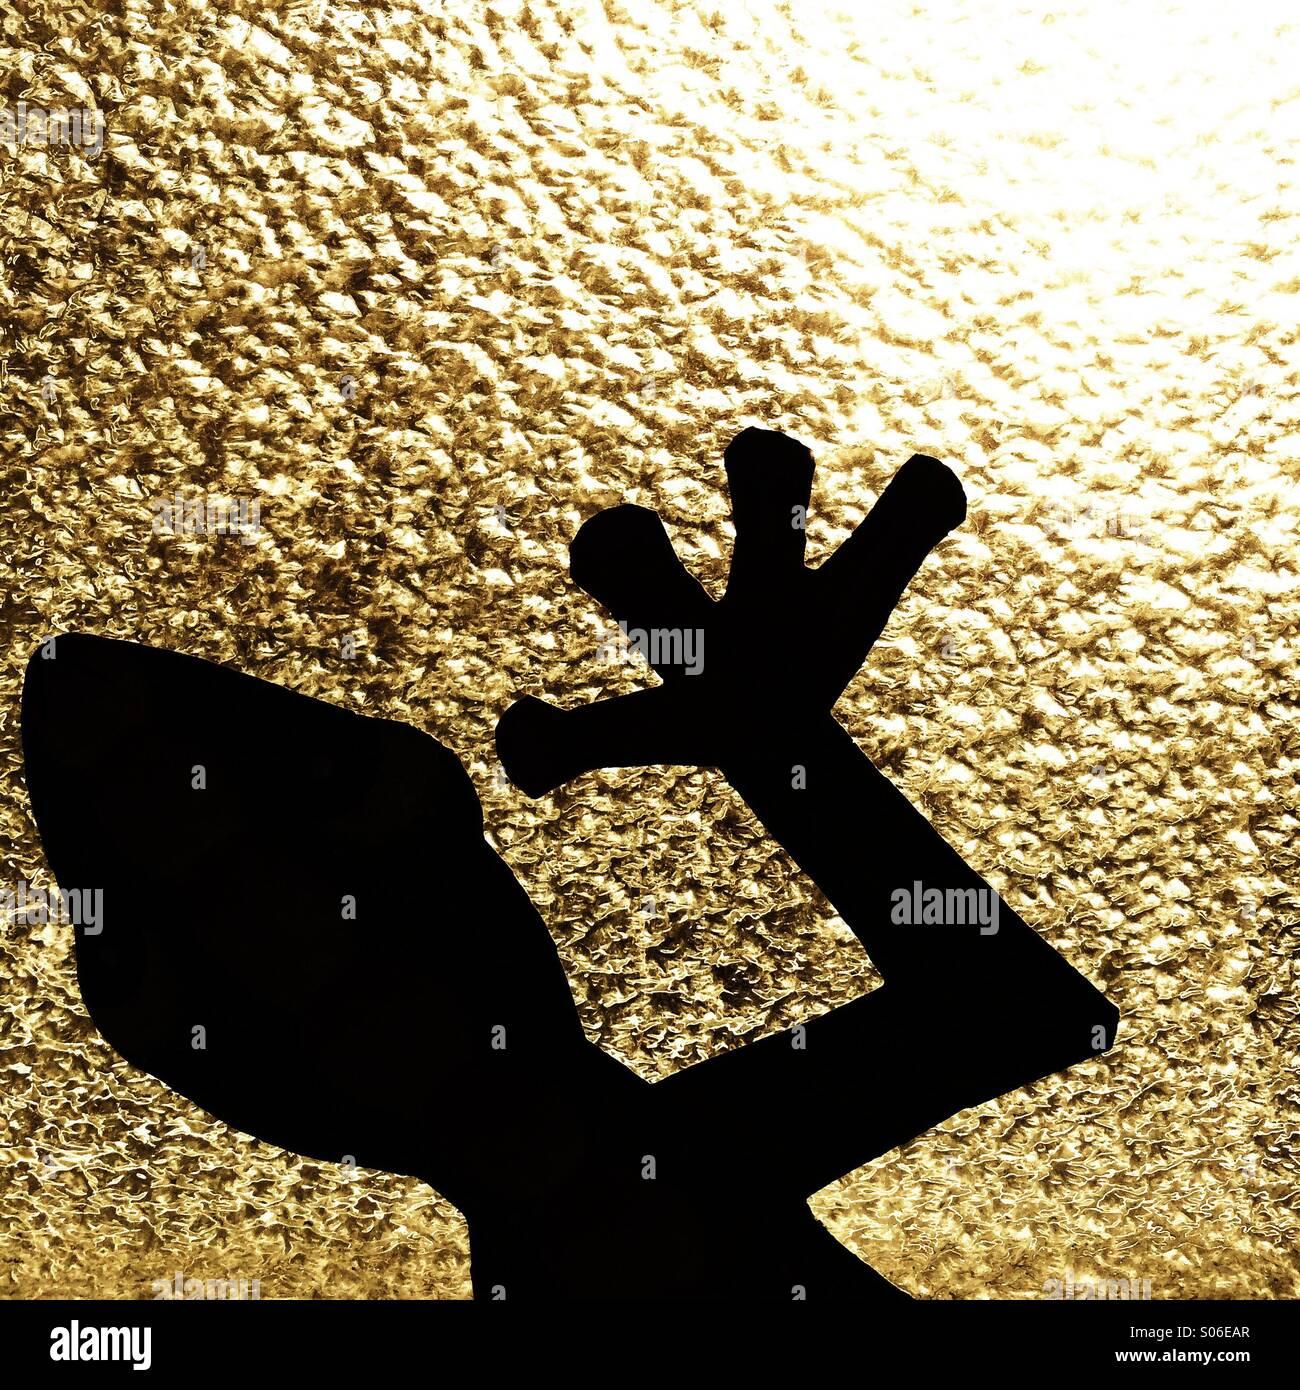 Gecko silhouette - Stock Image